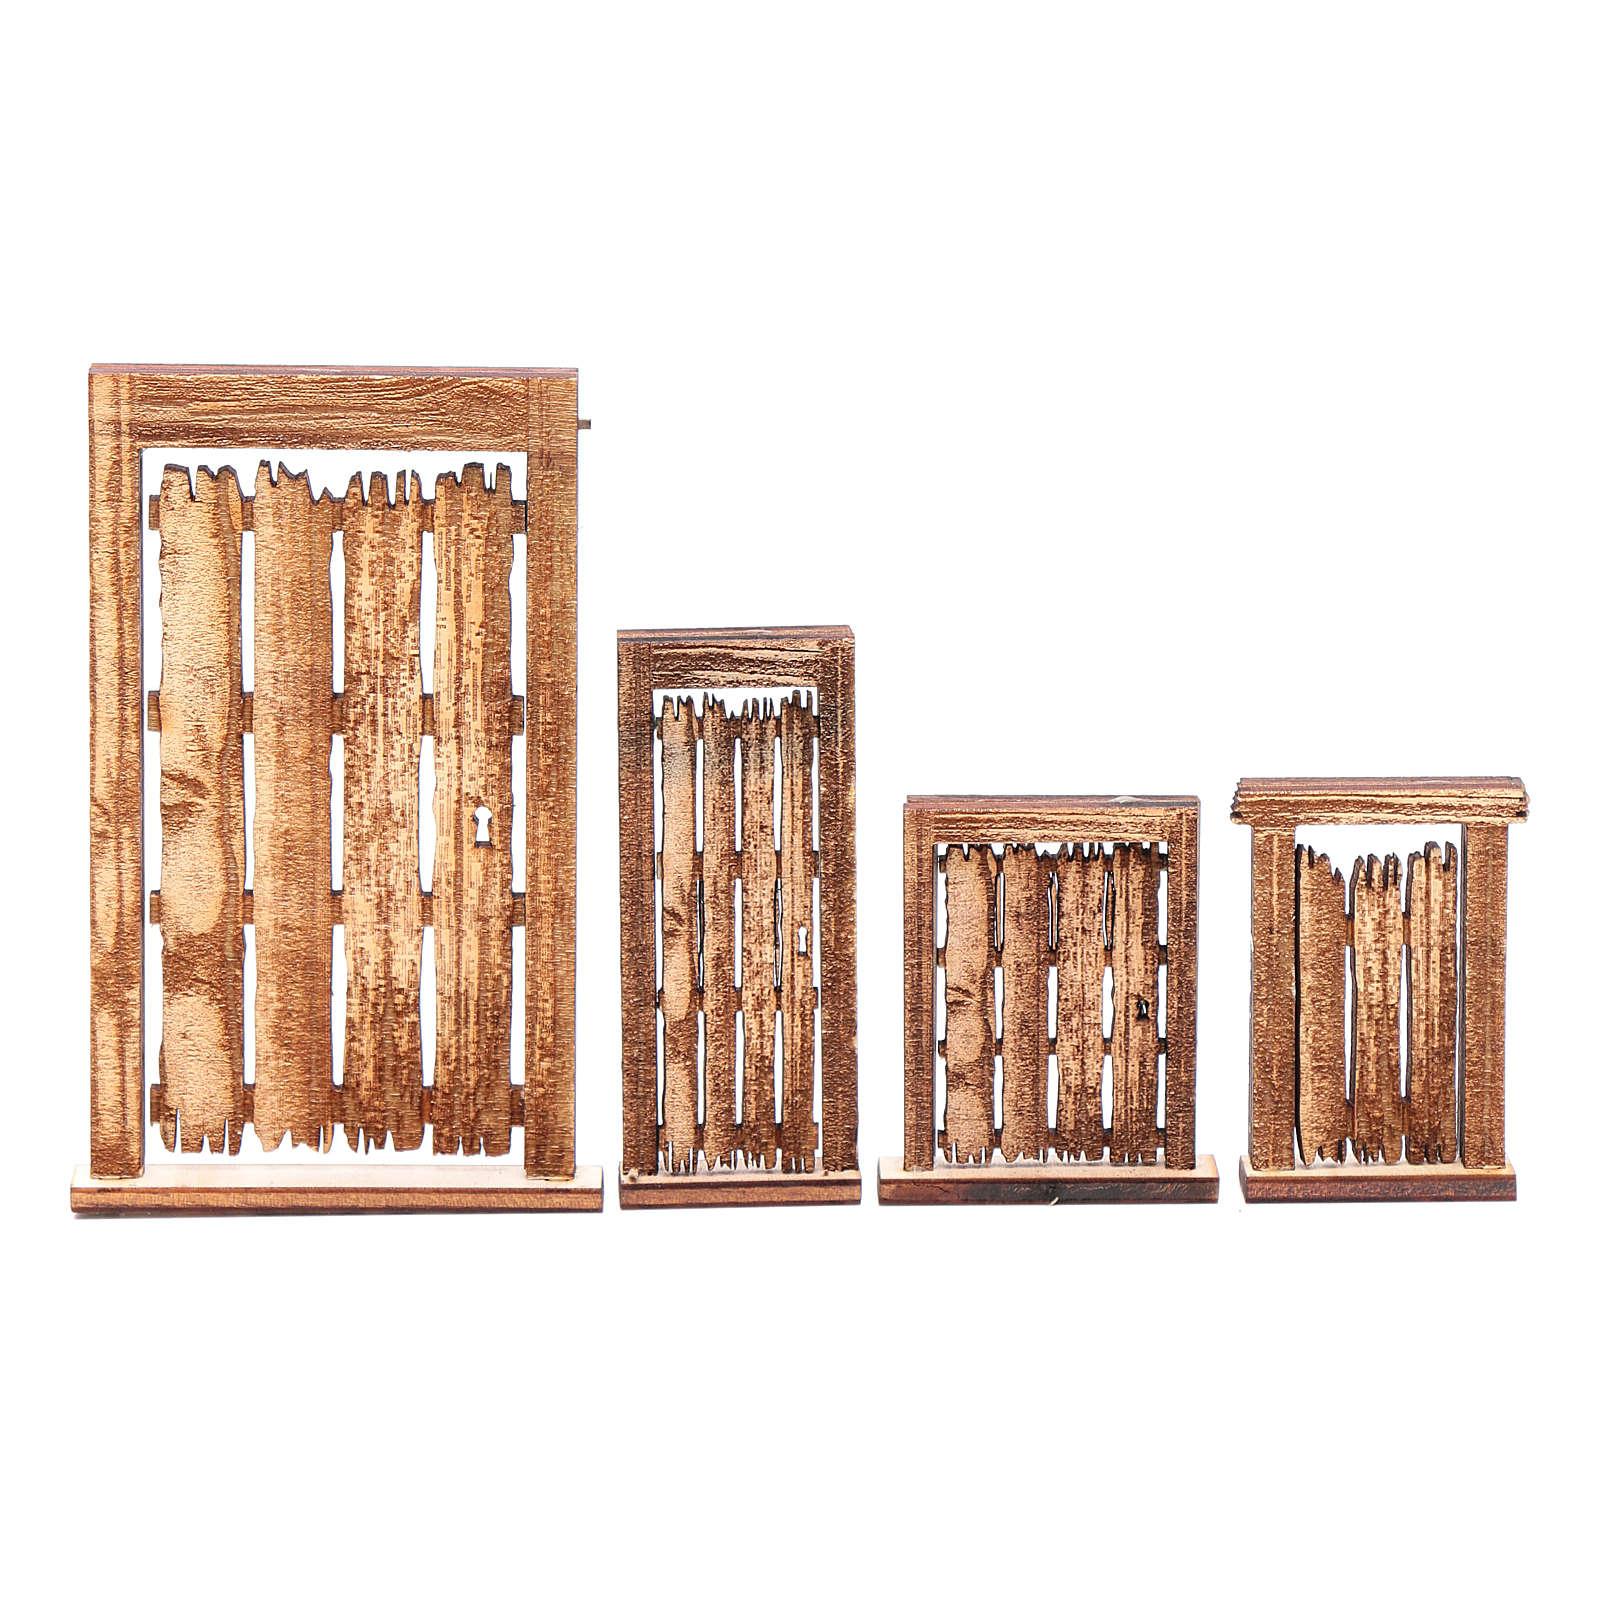 DIY Neapolitan nativity scene accessory door ruins 4 pieces 4